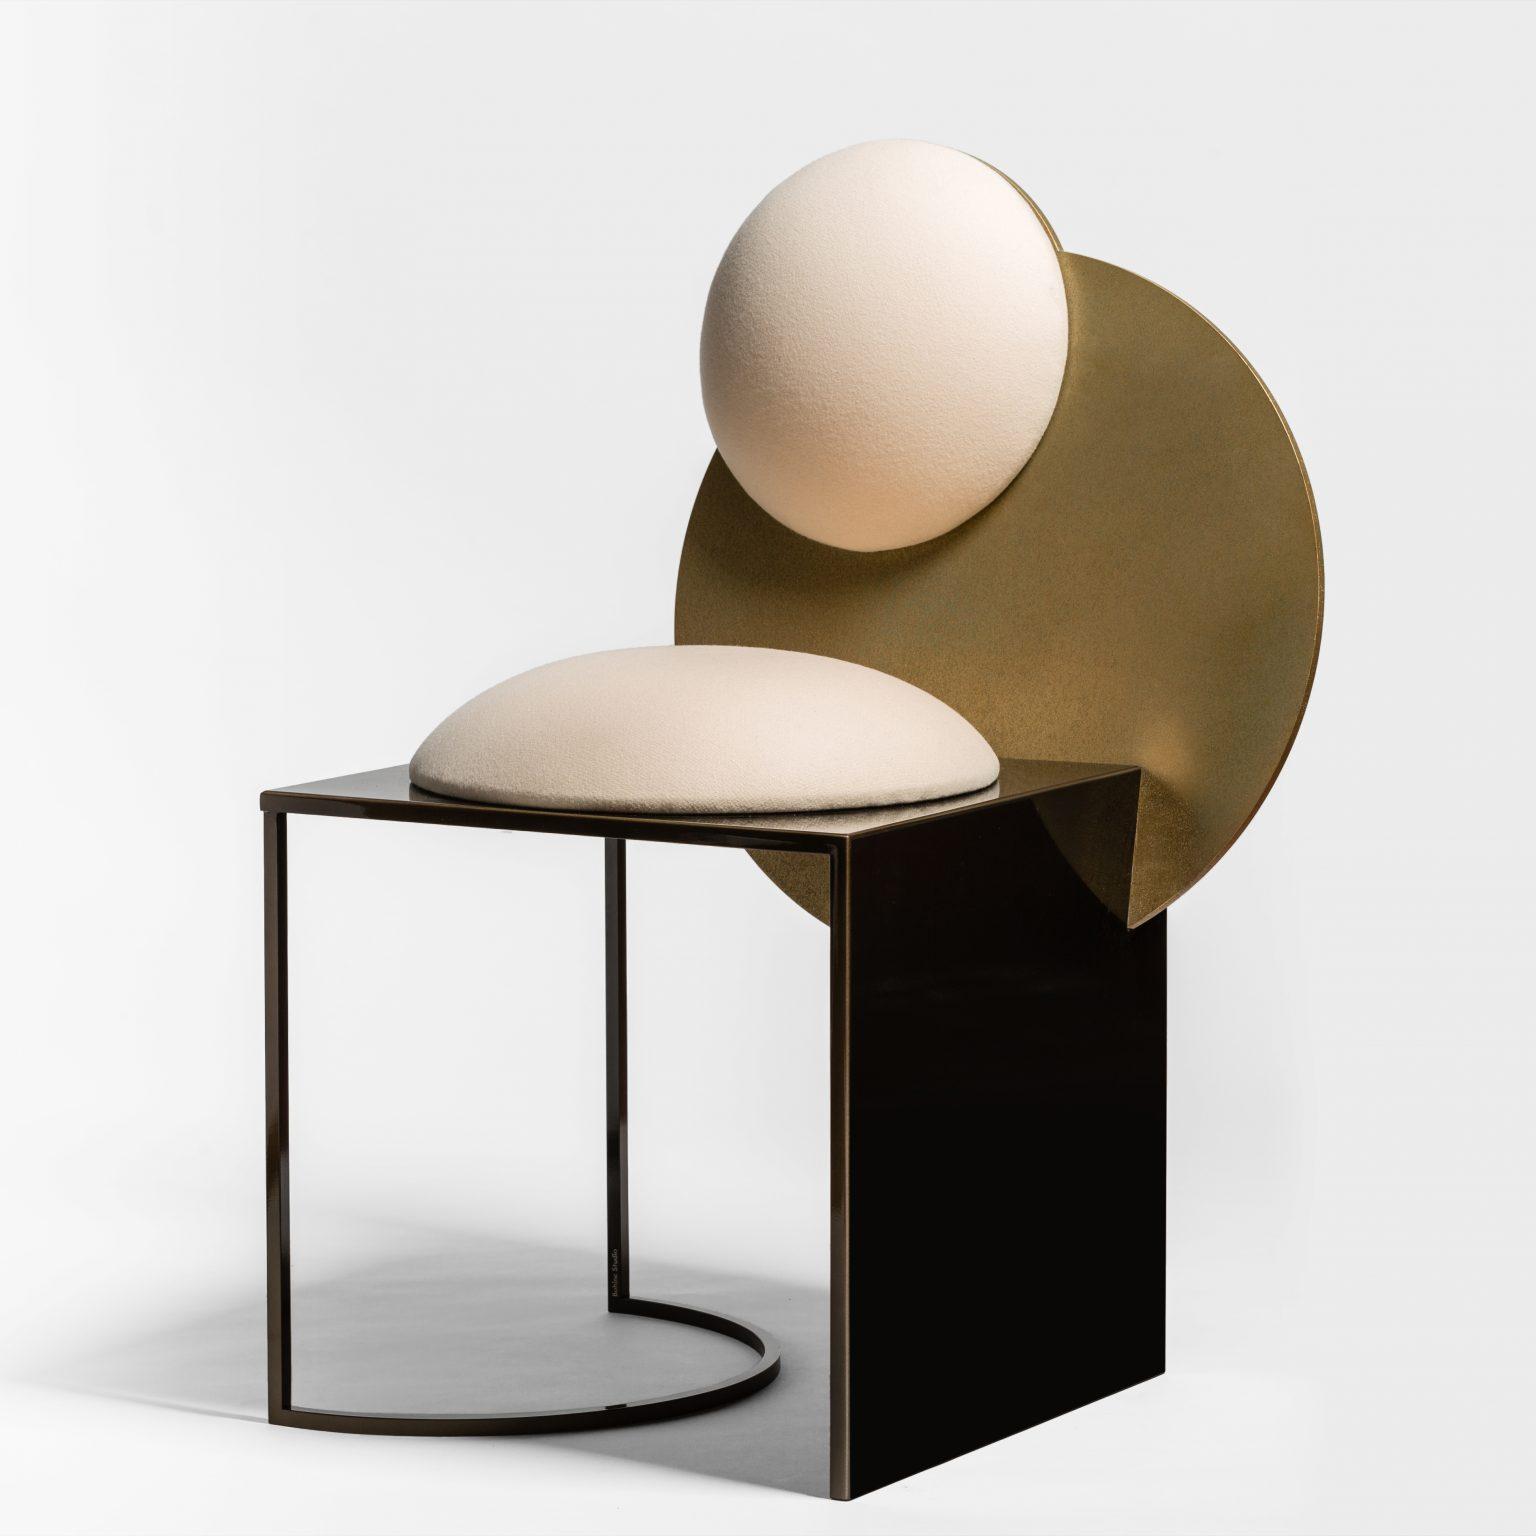 Biennale Interieur - Belgium's leading design and interior event - Celeste-chair.jpg